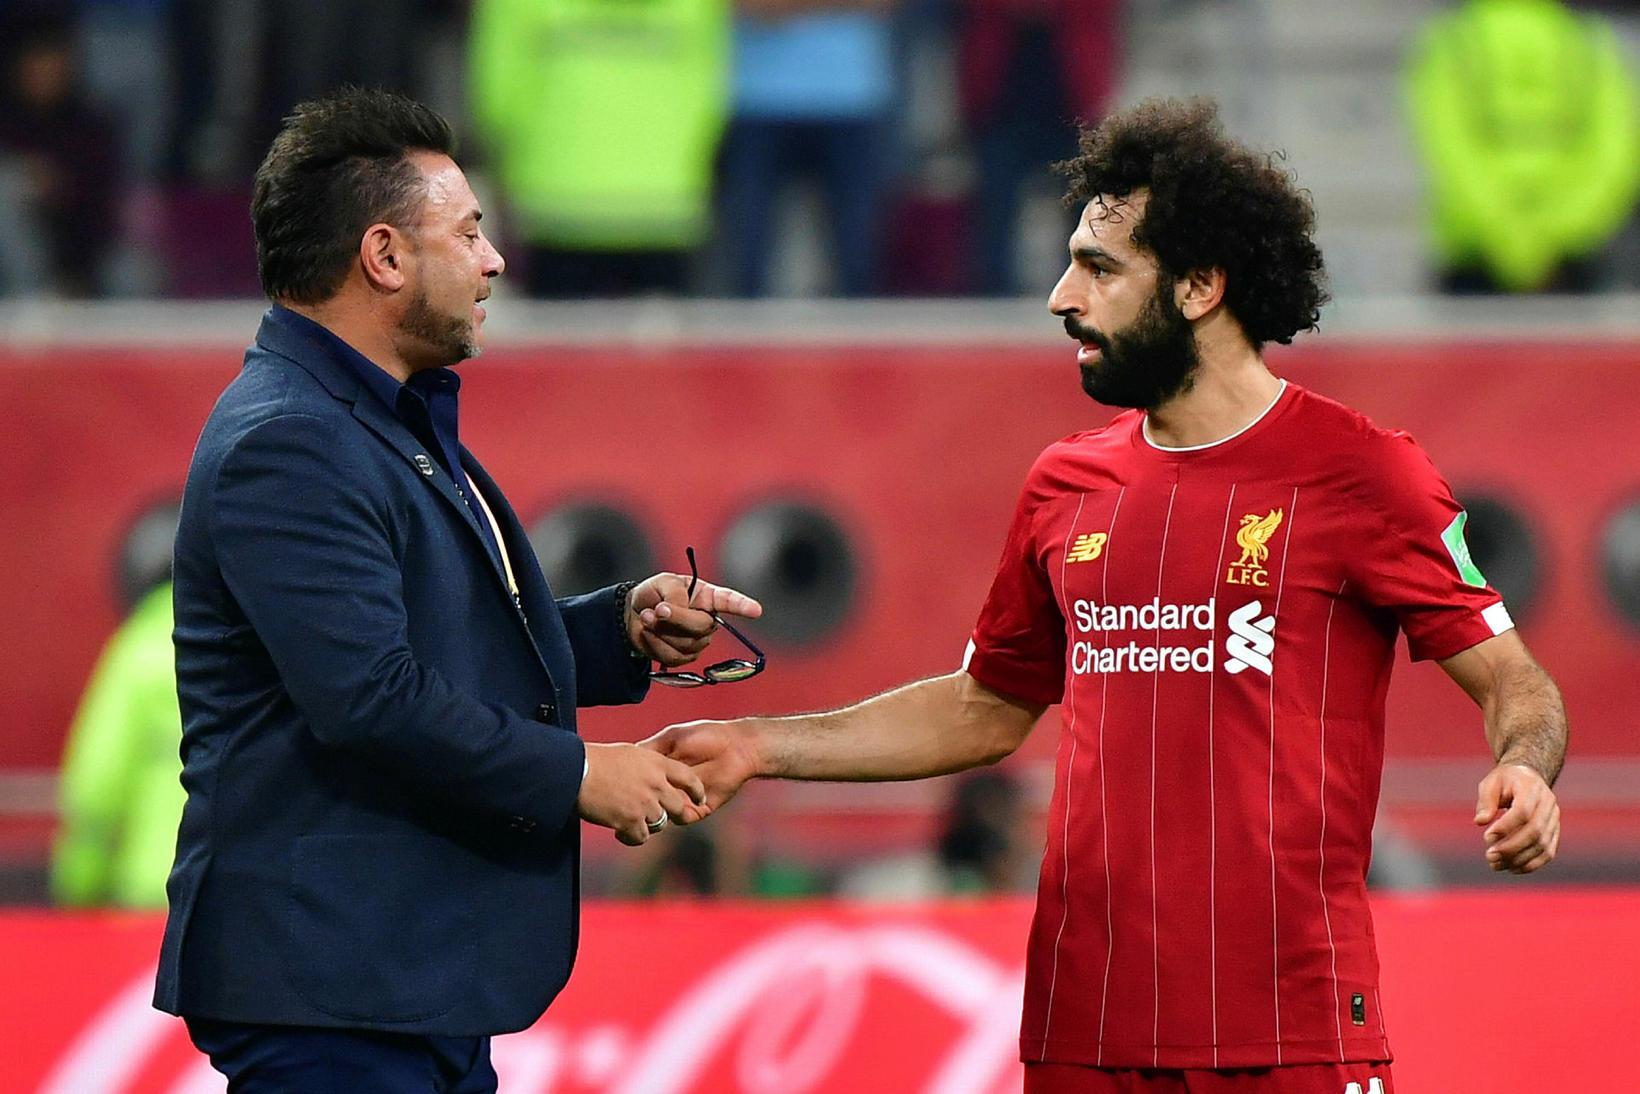 Antonio Mohamed og Mohamed Salah ræddu málin eftir leikinn.